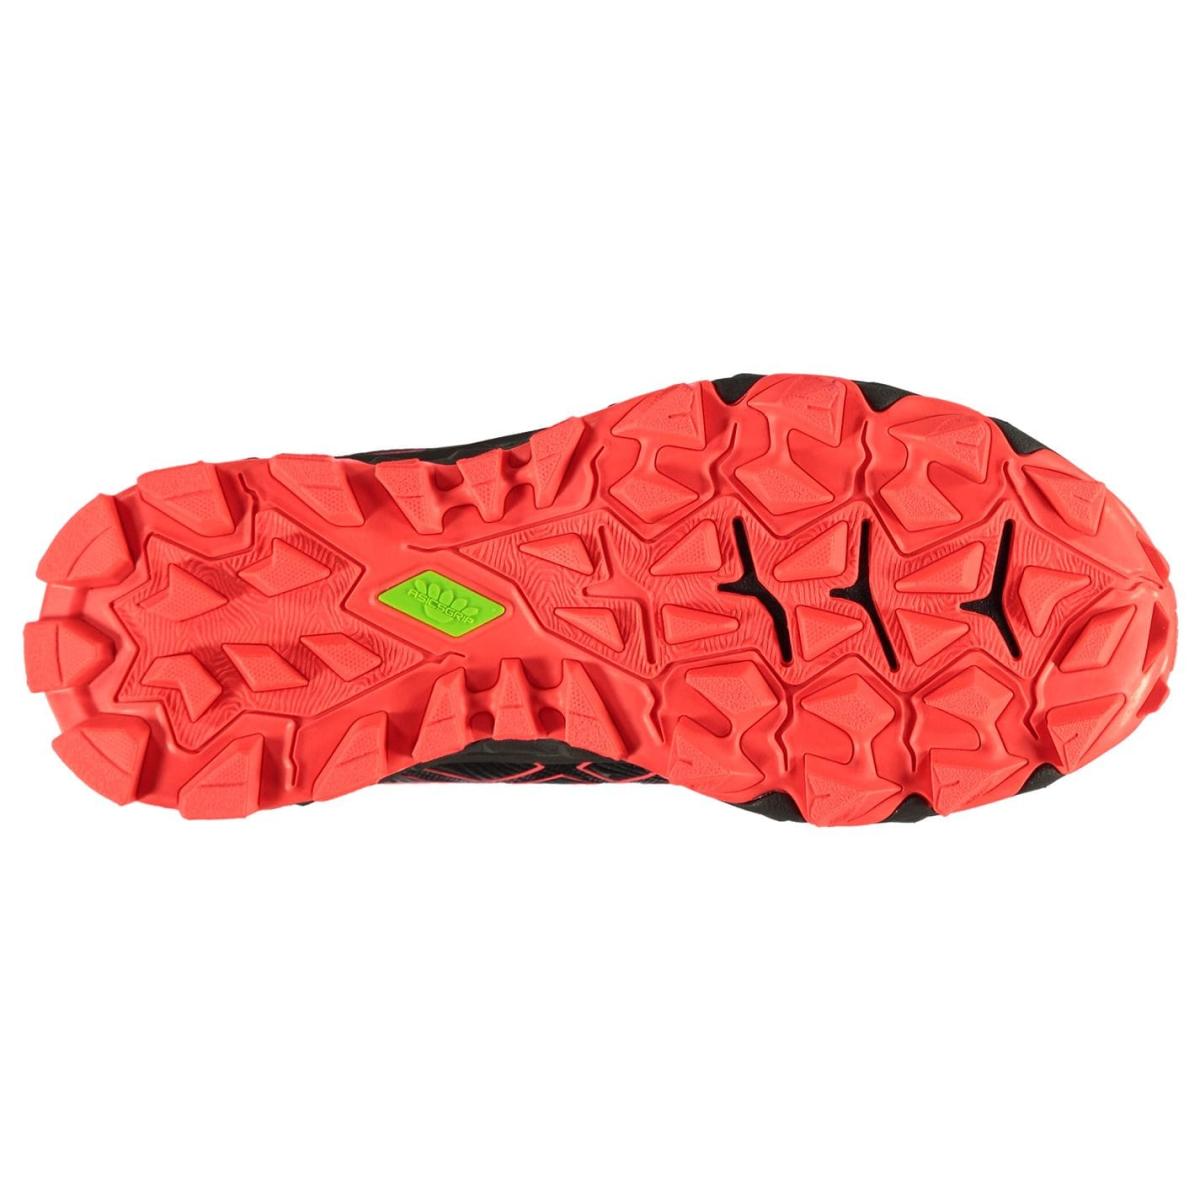 Asics-Gel-Fujitrabuco-Laufschuhe-Damen-Sportschuhe-Turnschuhe-Jogging-6015 Indexbild 3